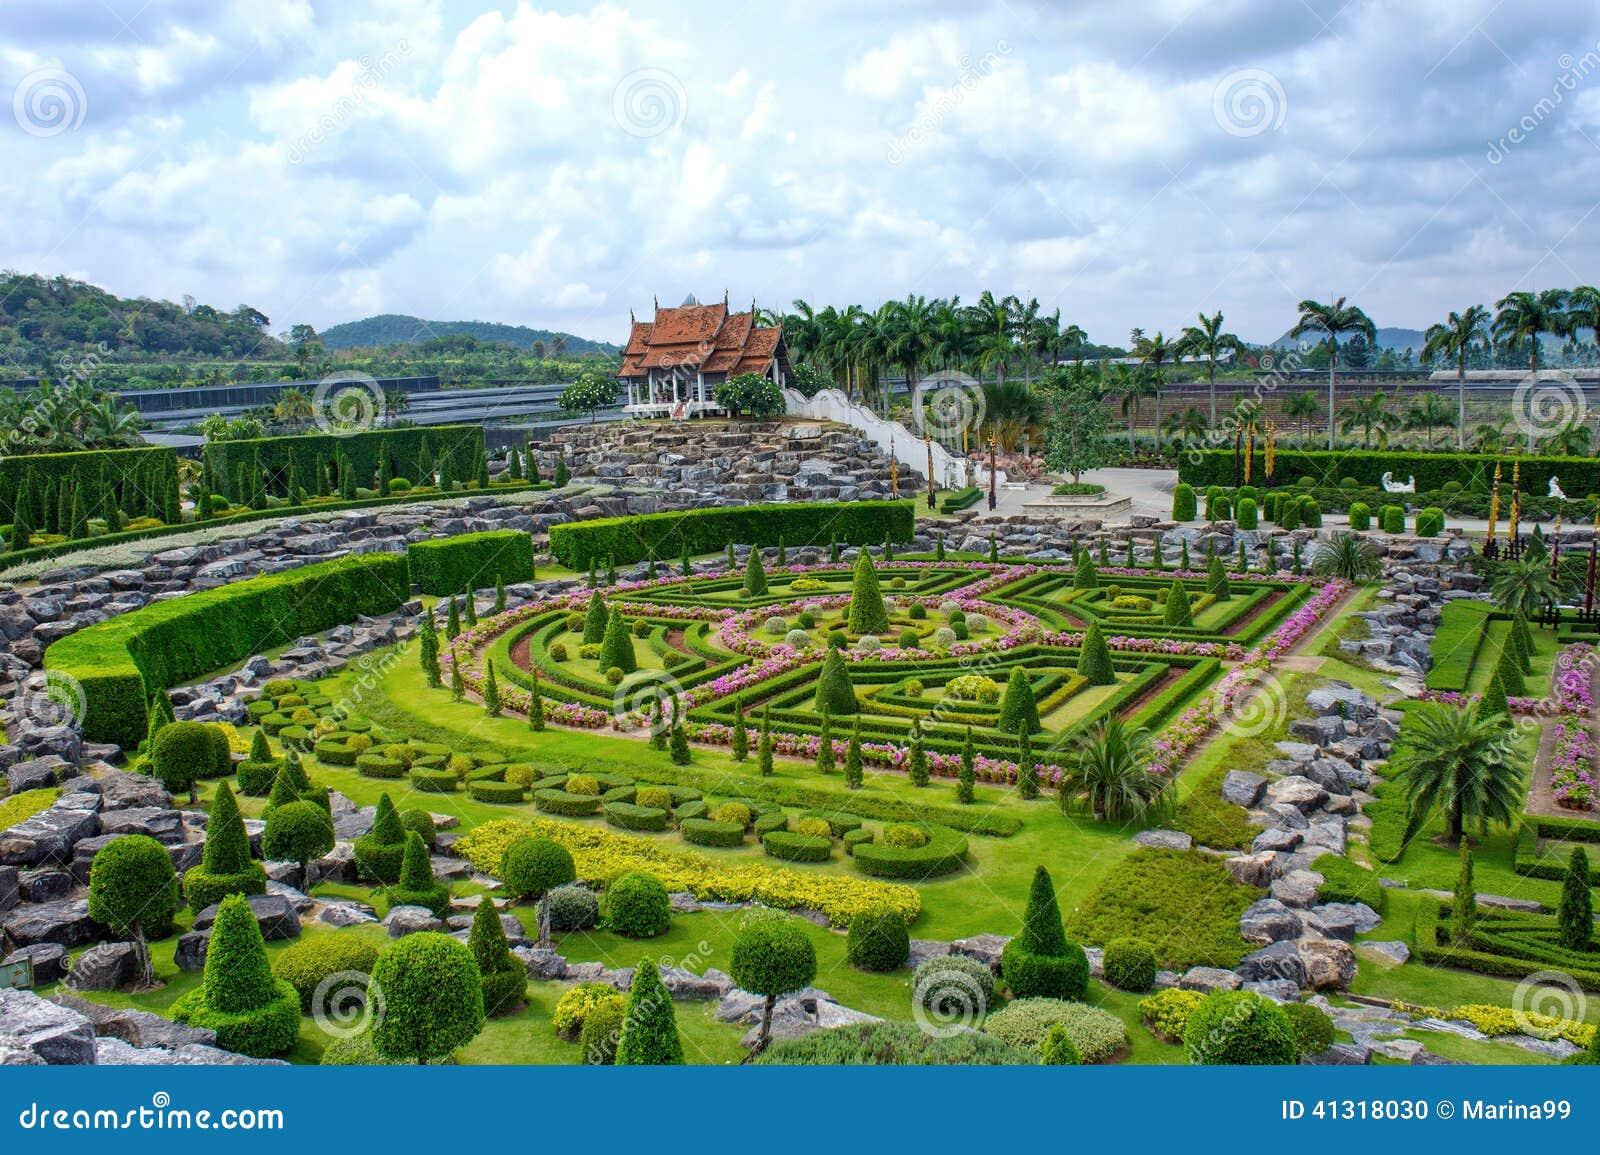 Nong Nooch Tropical Botanical Garden, Pattaya, Thailand ...